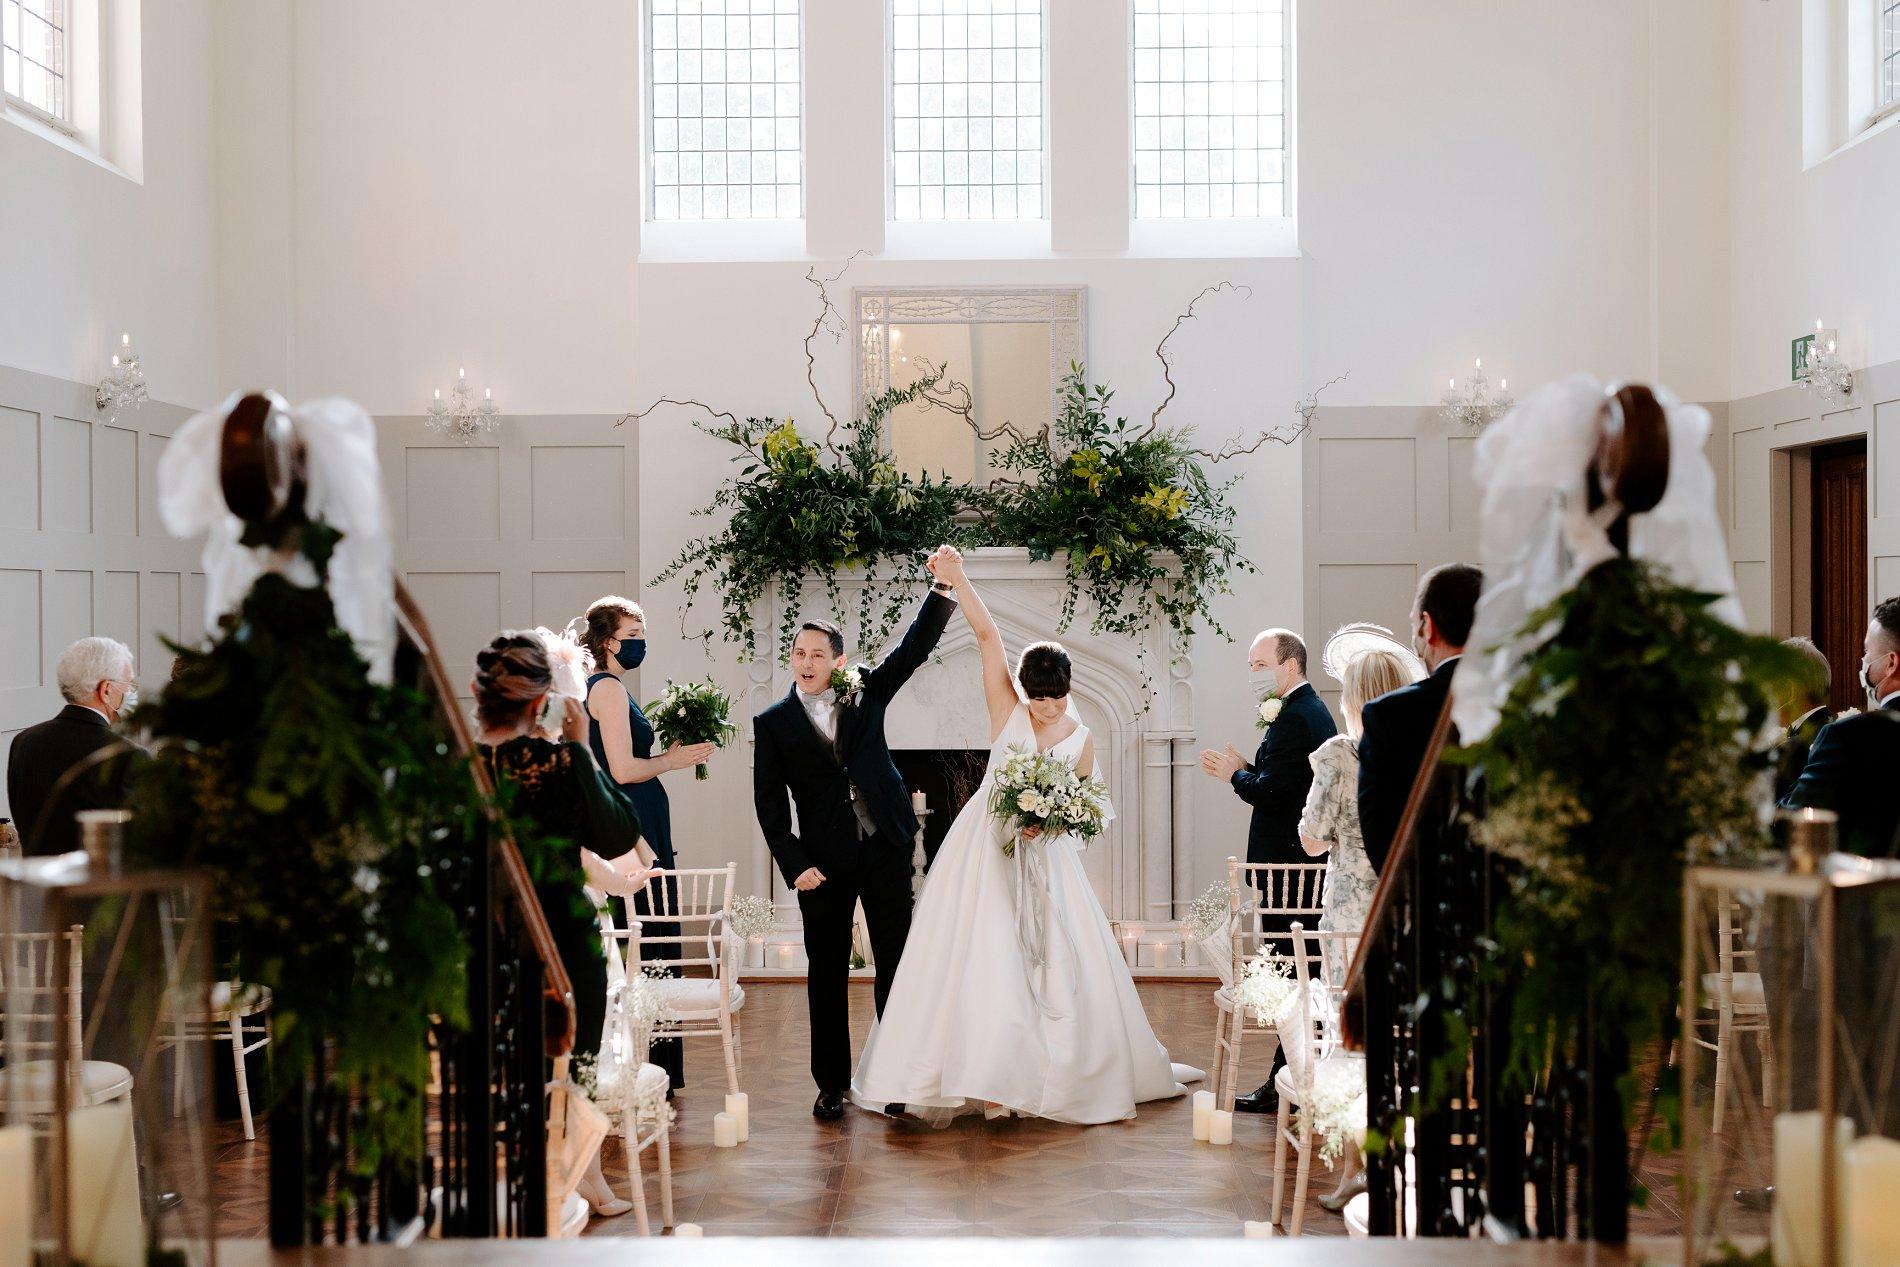 An Elegant White Wedding at Thicket Priory (c) Carla Whittingham Photography (39)